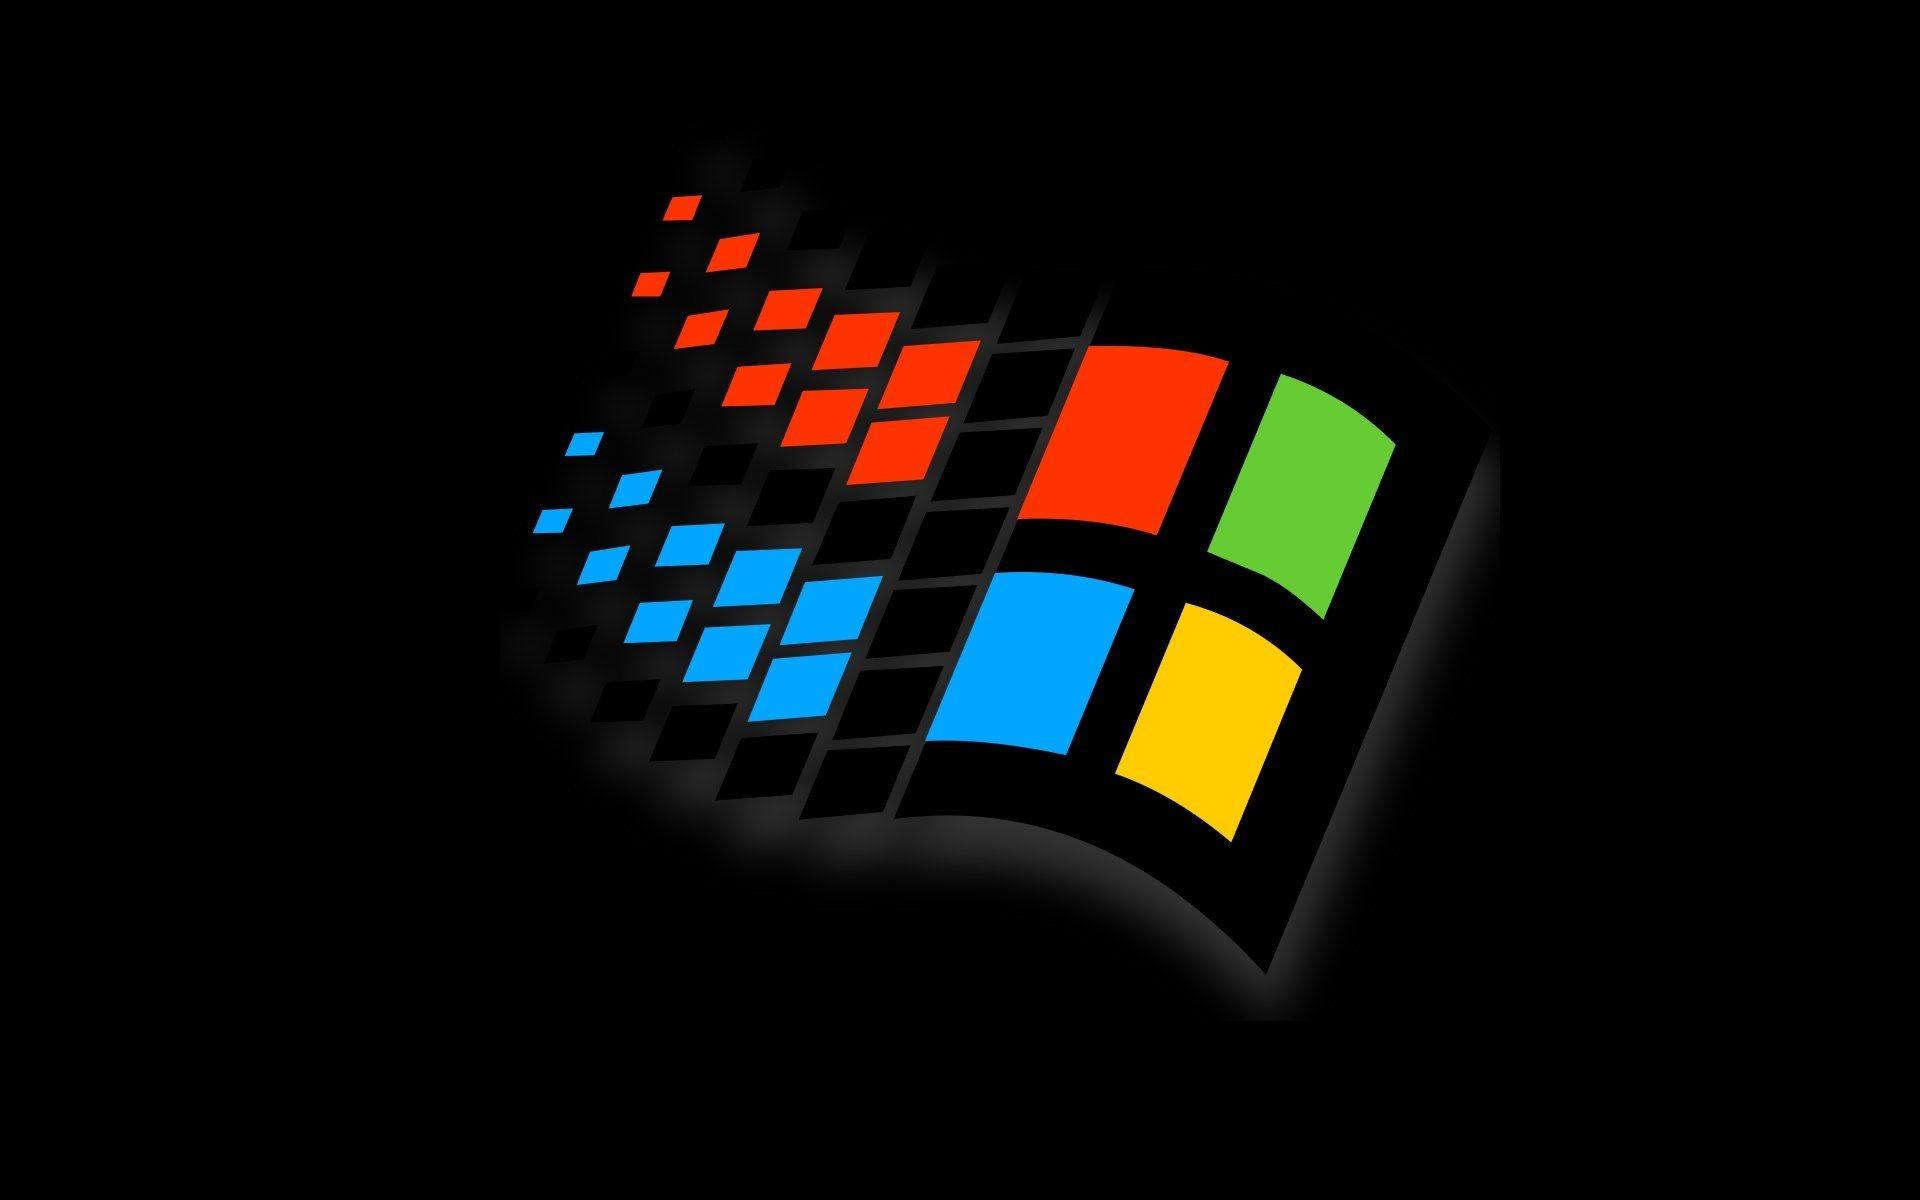 Windows 98 wallpaper ·① Download free amazing HD ...